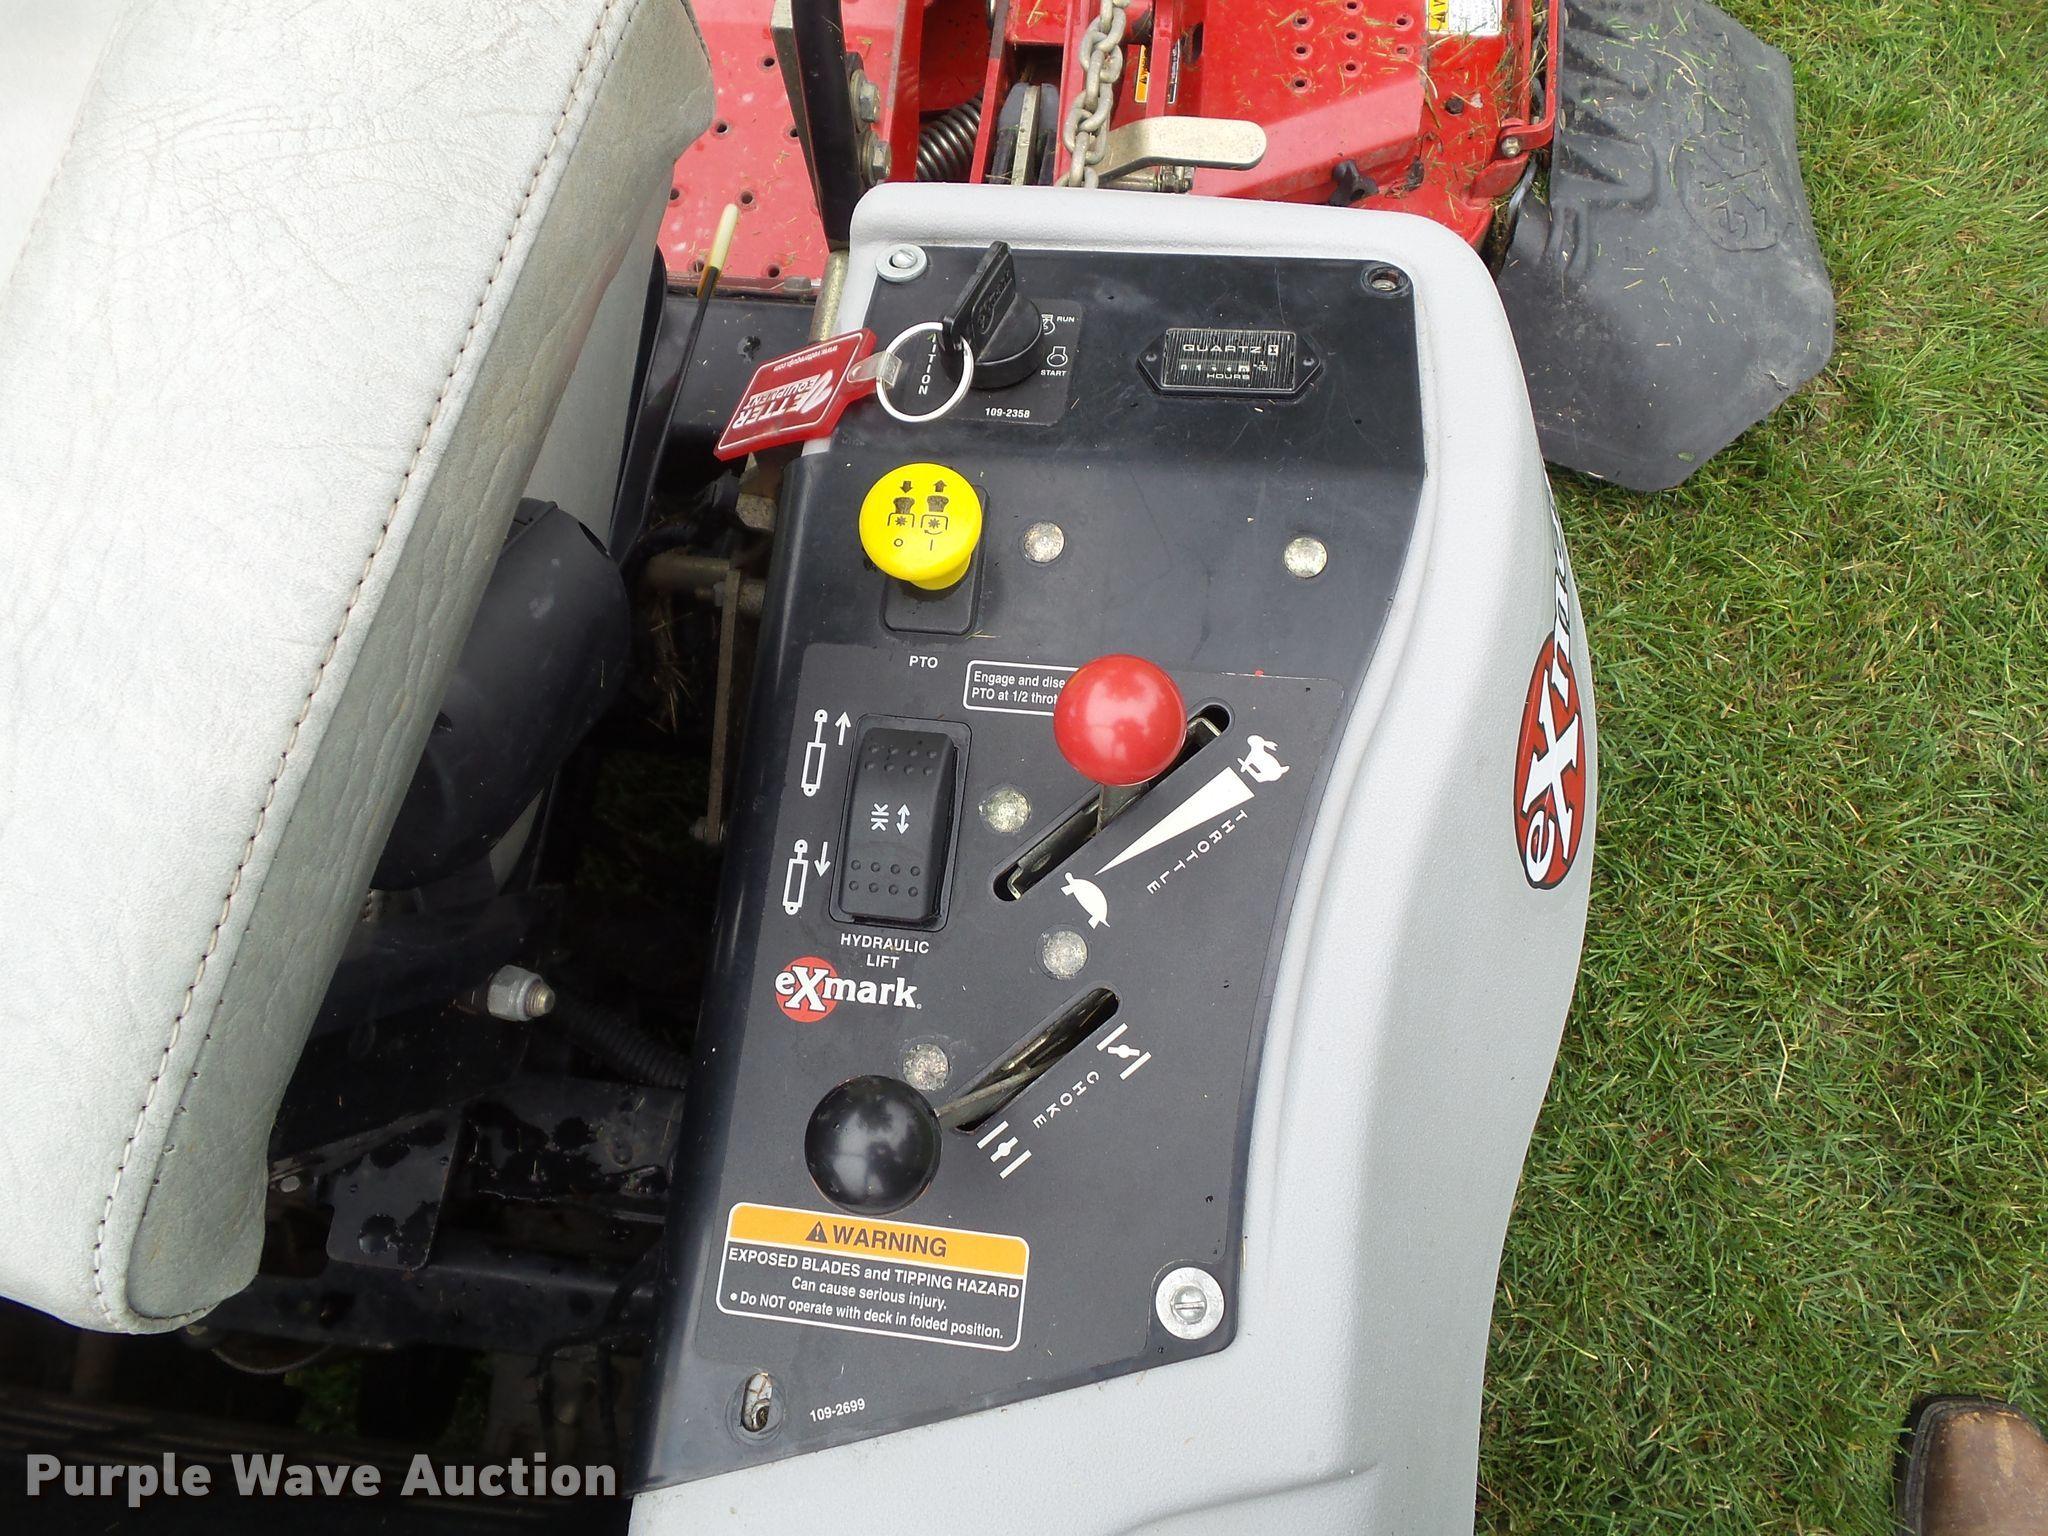 Exmark Front Runner FR23KC lawn mower | Item EM9765 | SOLD!